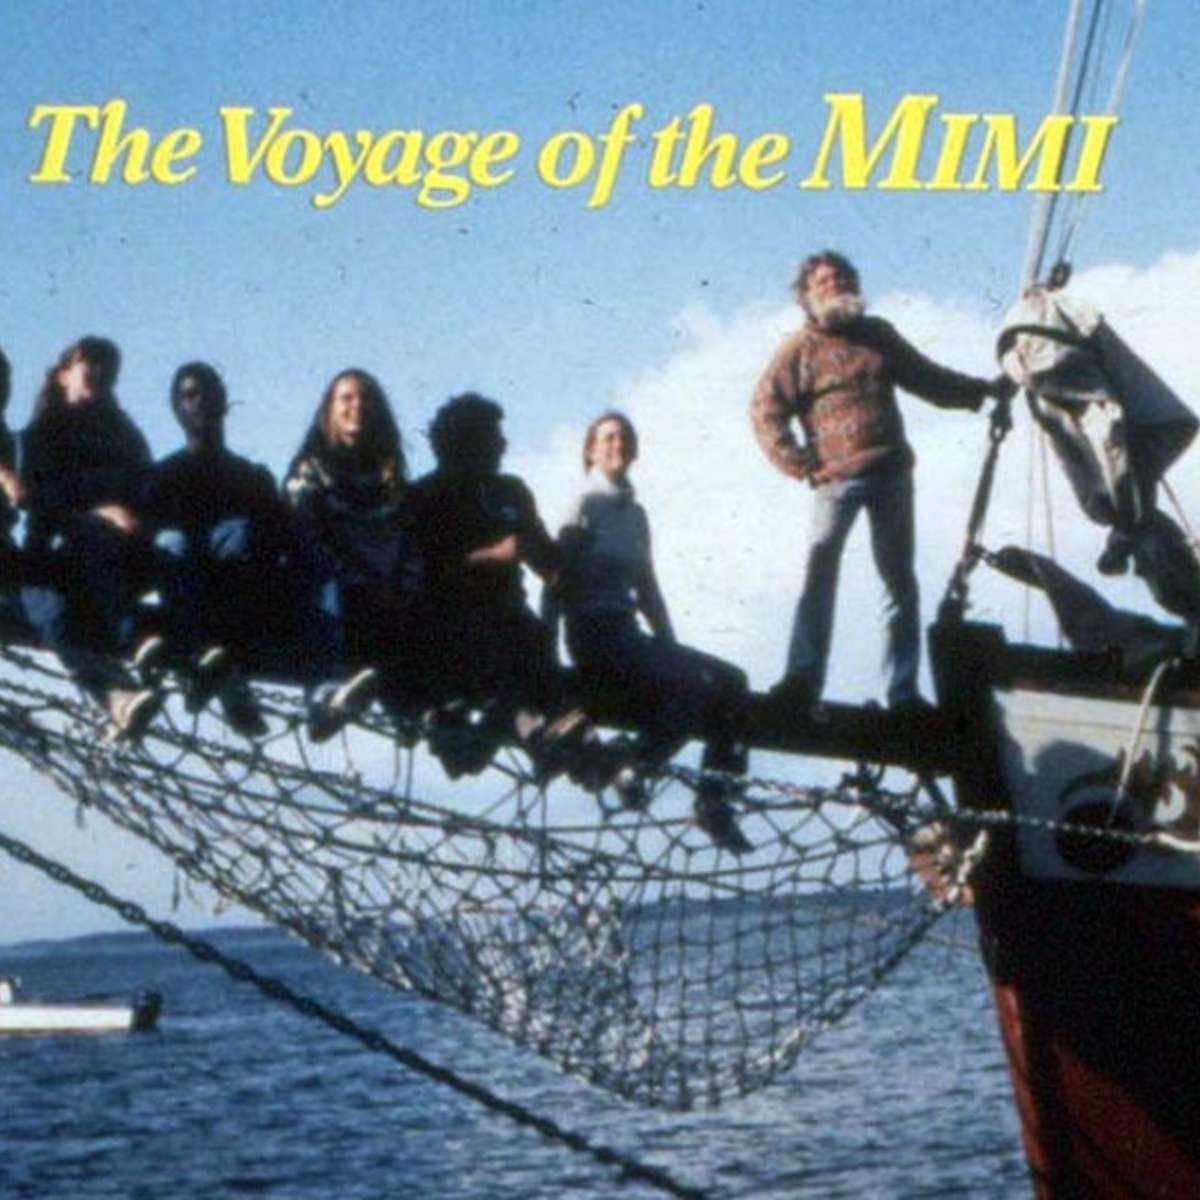 voyage_of_the_mimi_pbs_01.jpg